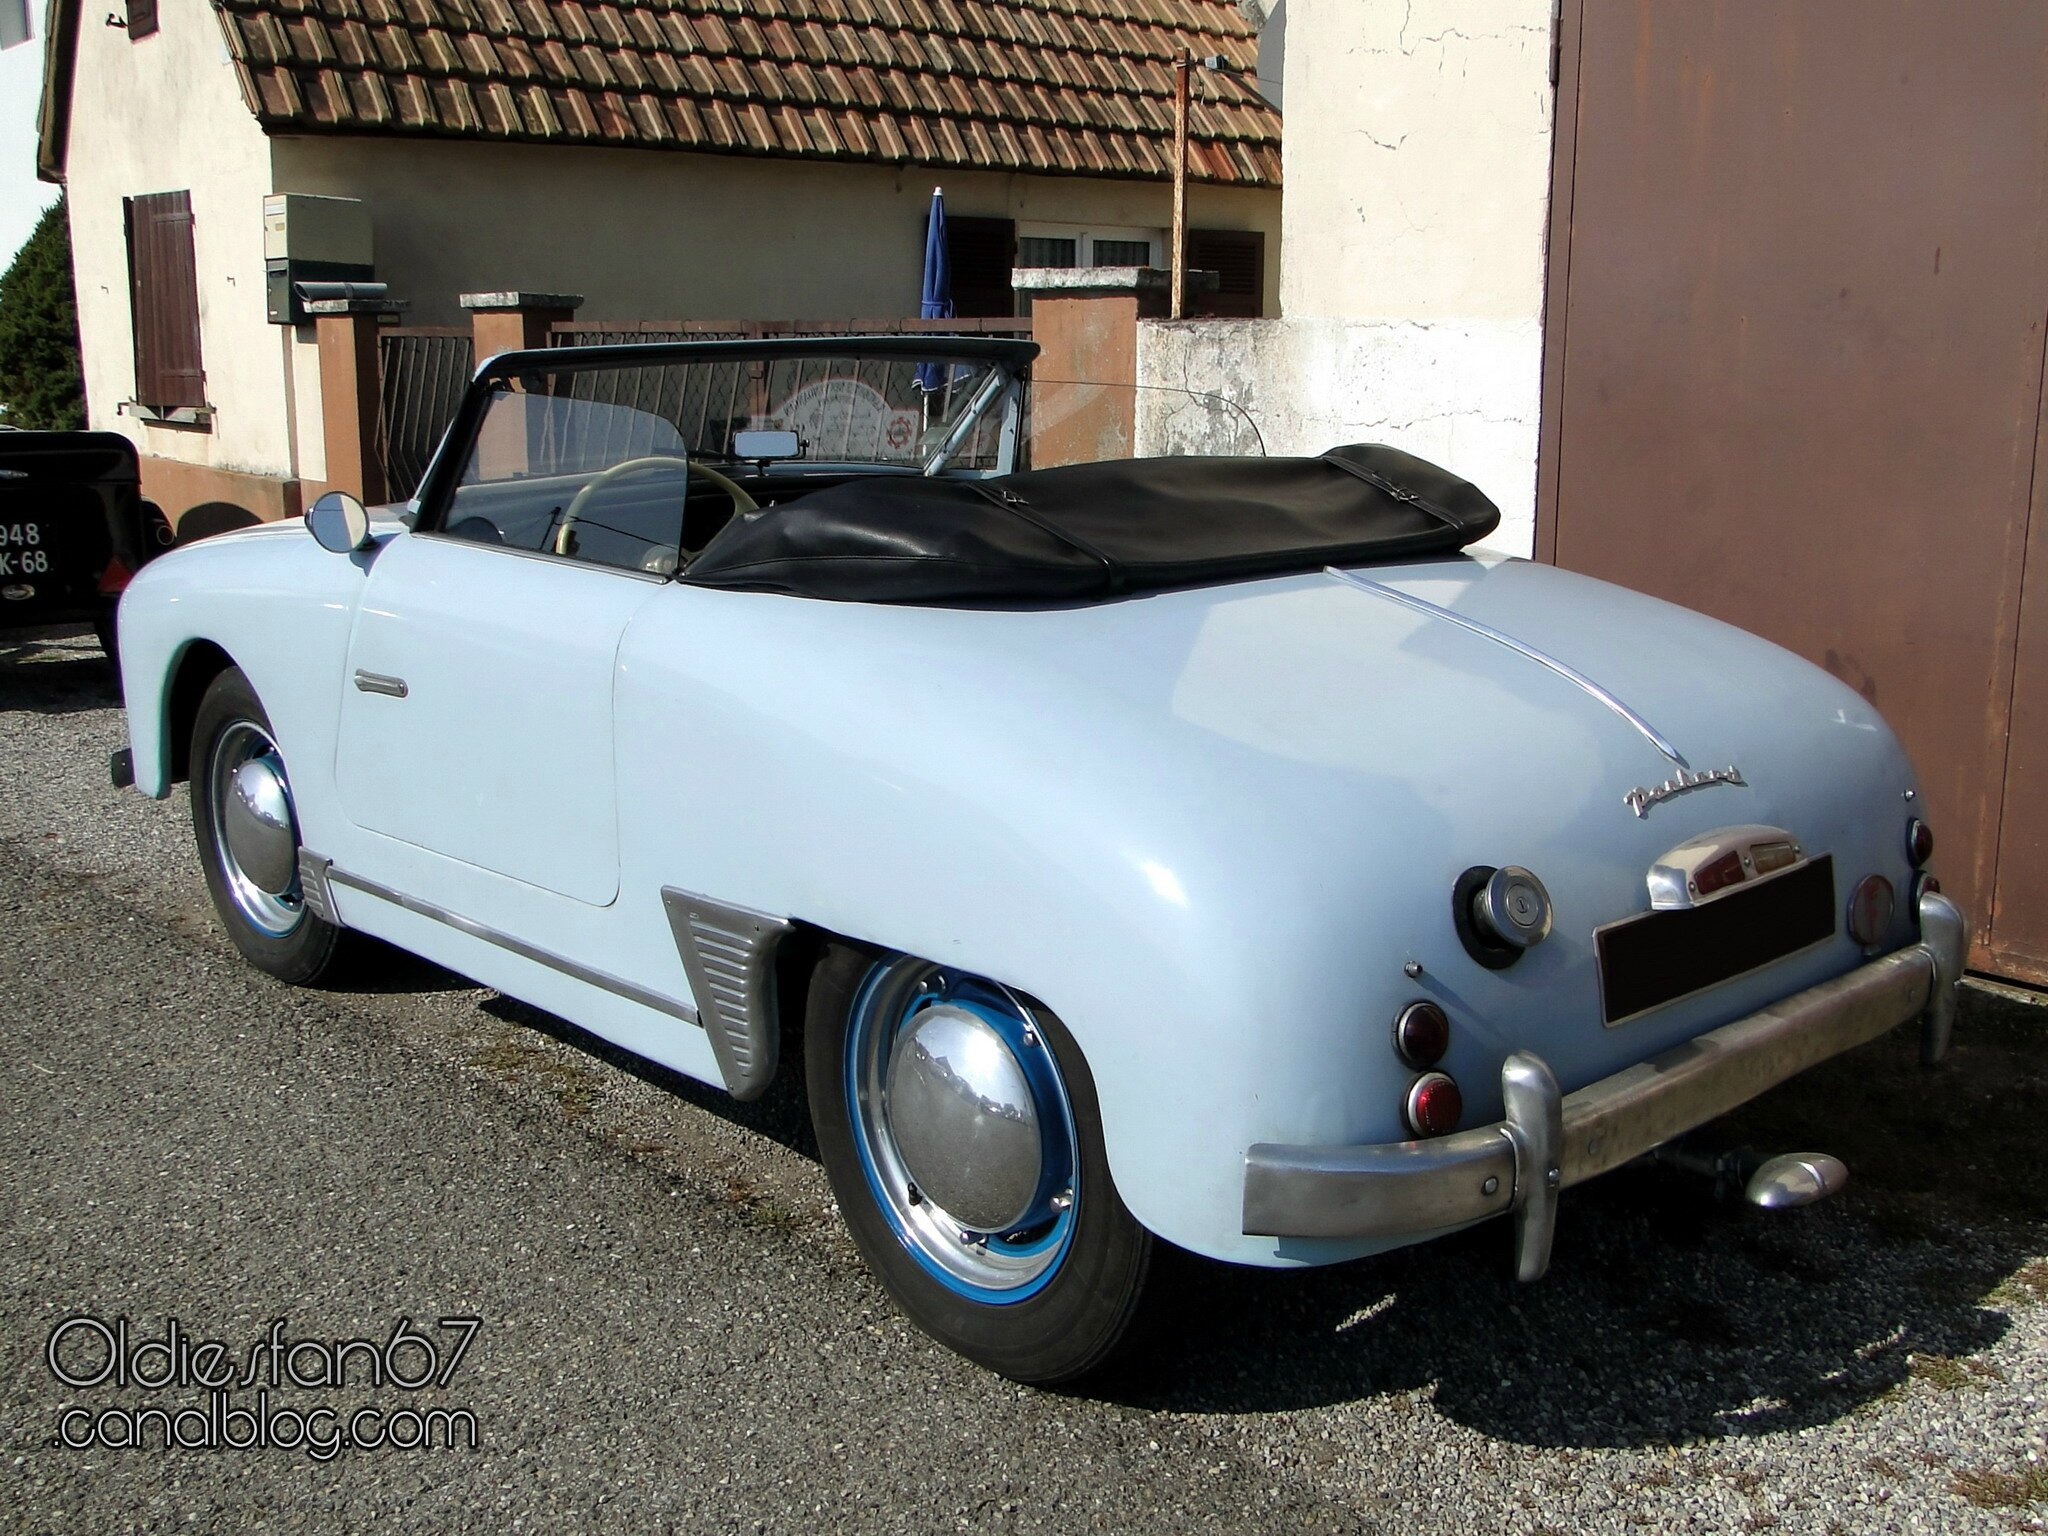 panhard-dyna-junior-cabriolet-1954-1956-2